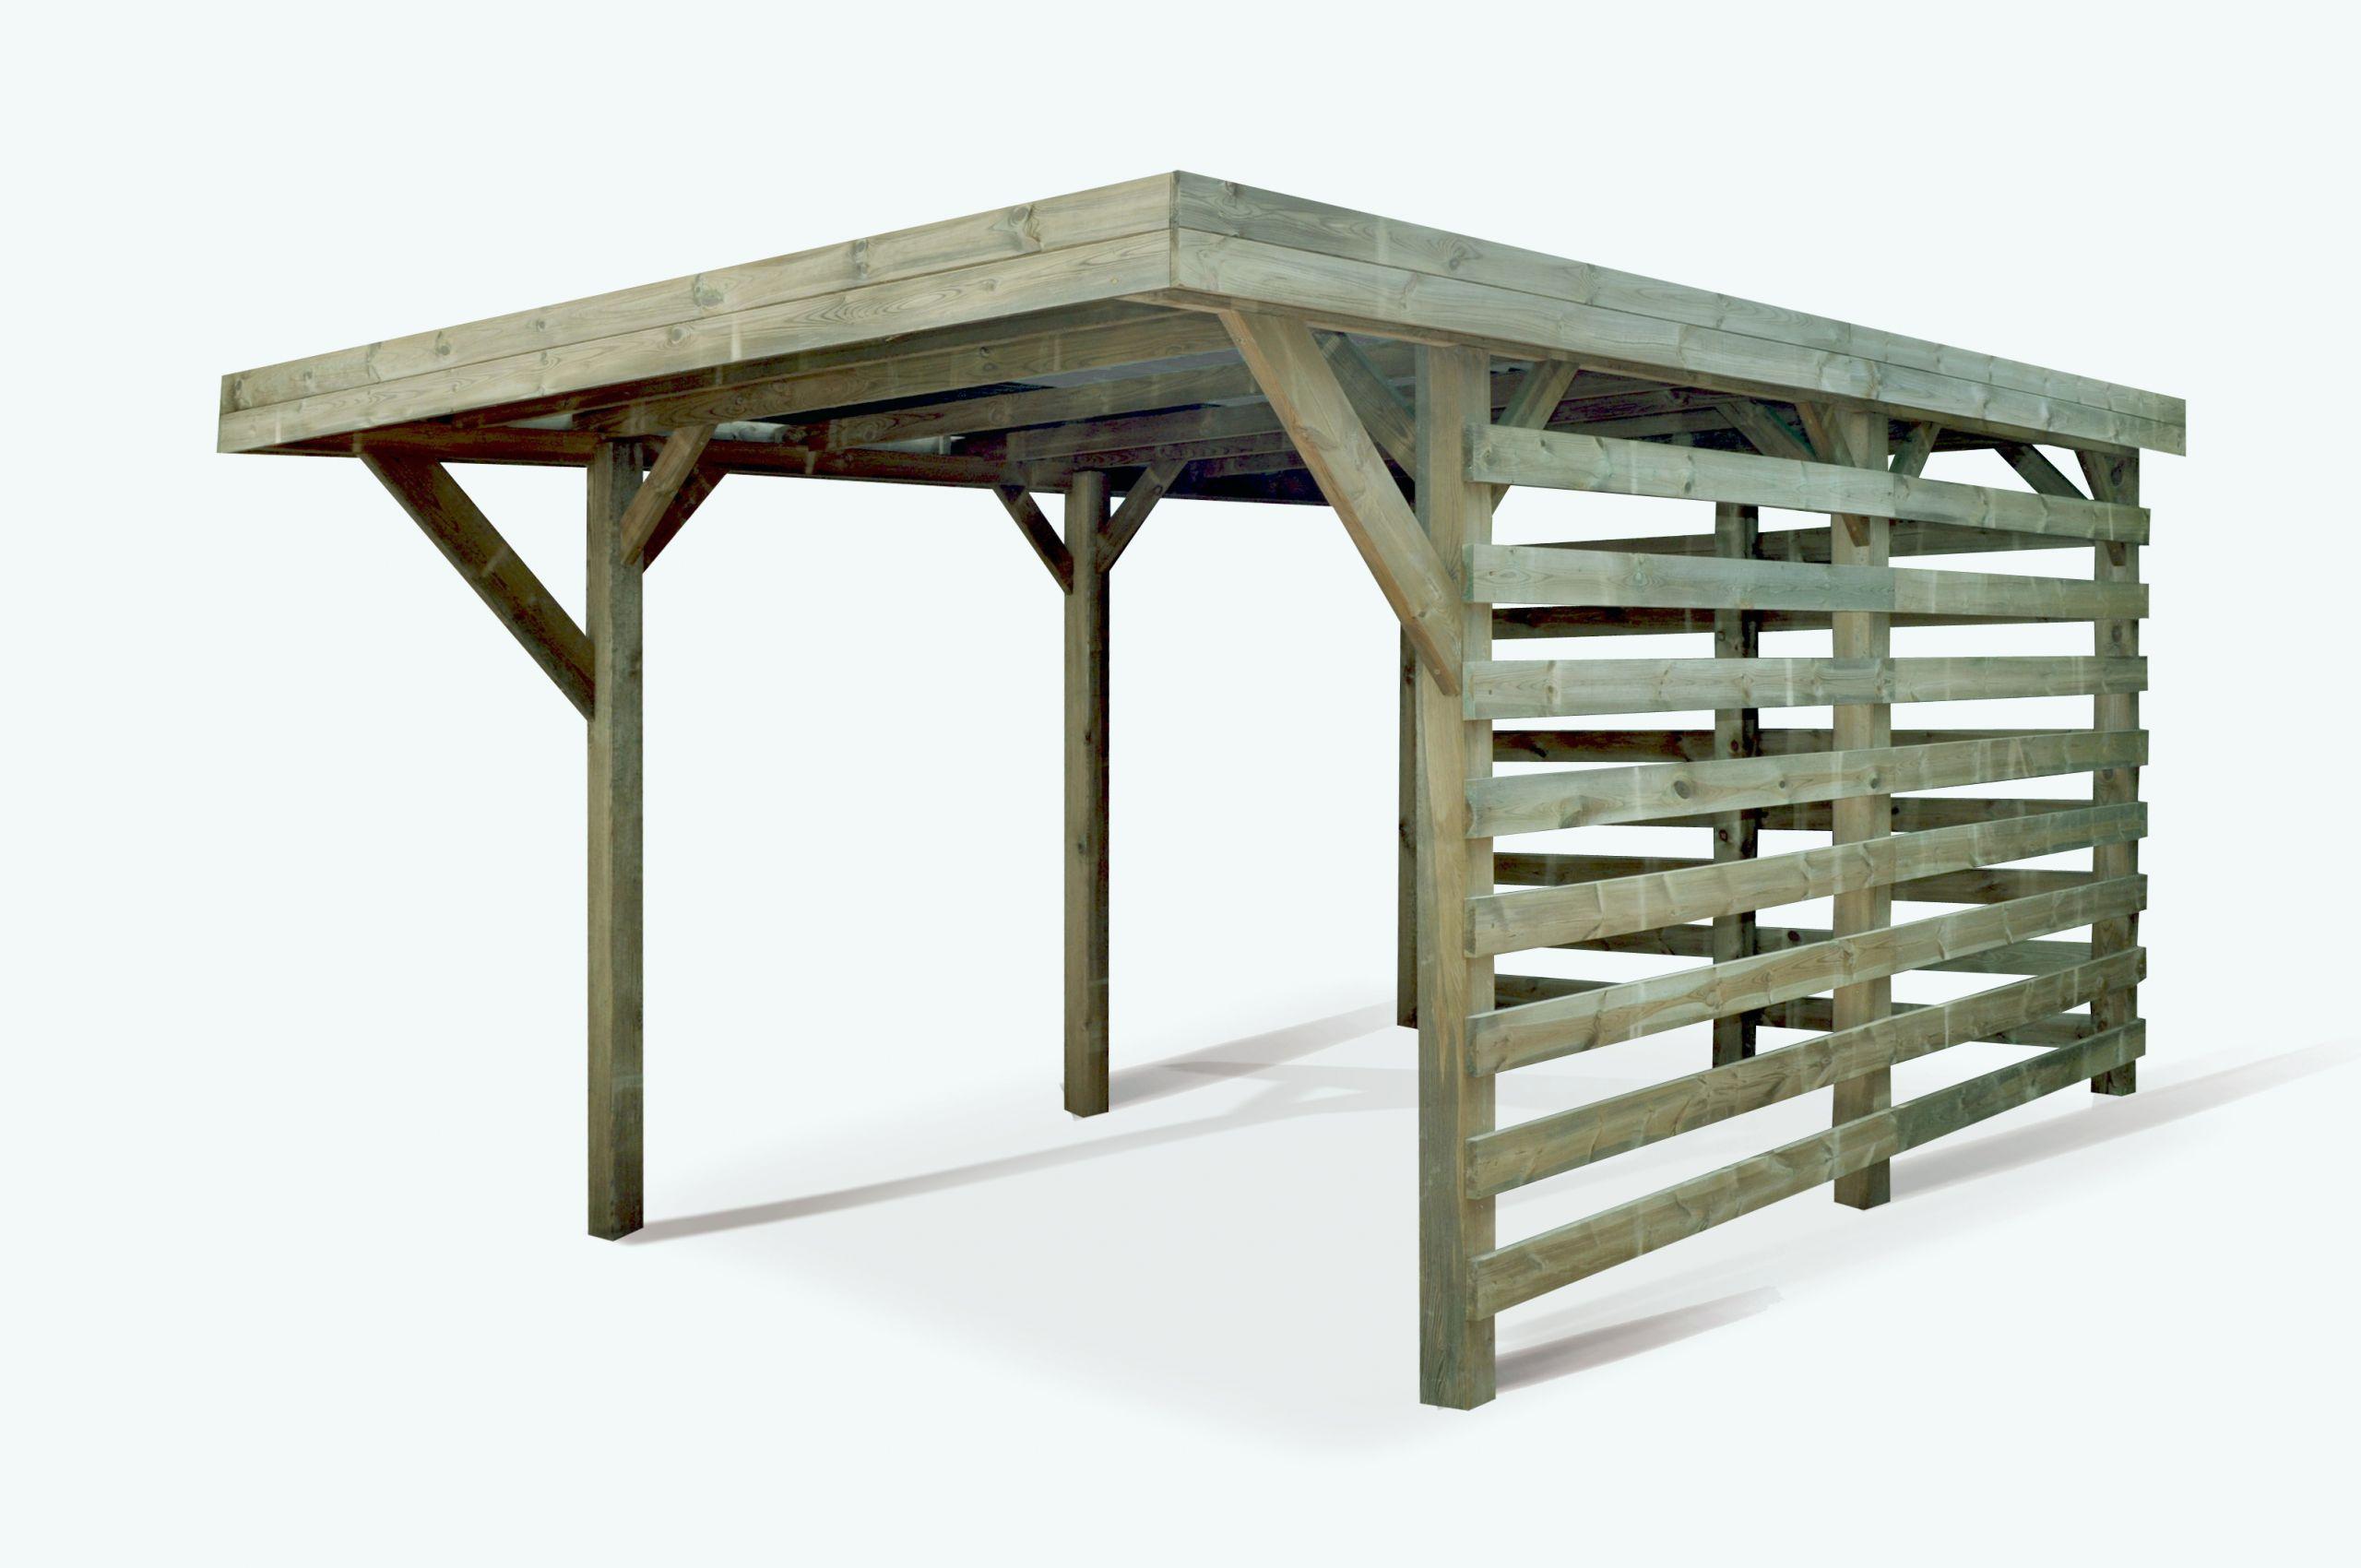 meuble de jardin carrefour elegant catalogue carrefour abris de jardin de meuble de jardin carrefour scaled